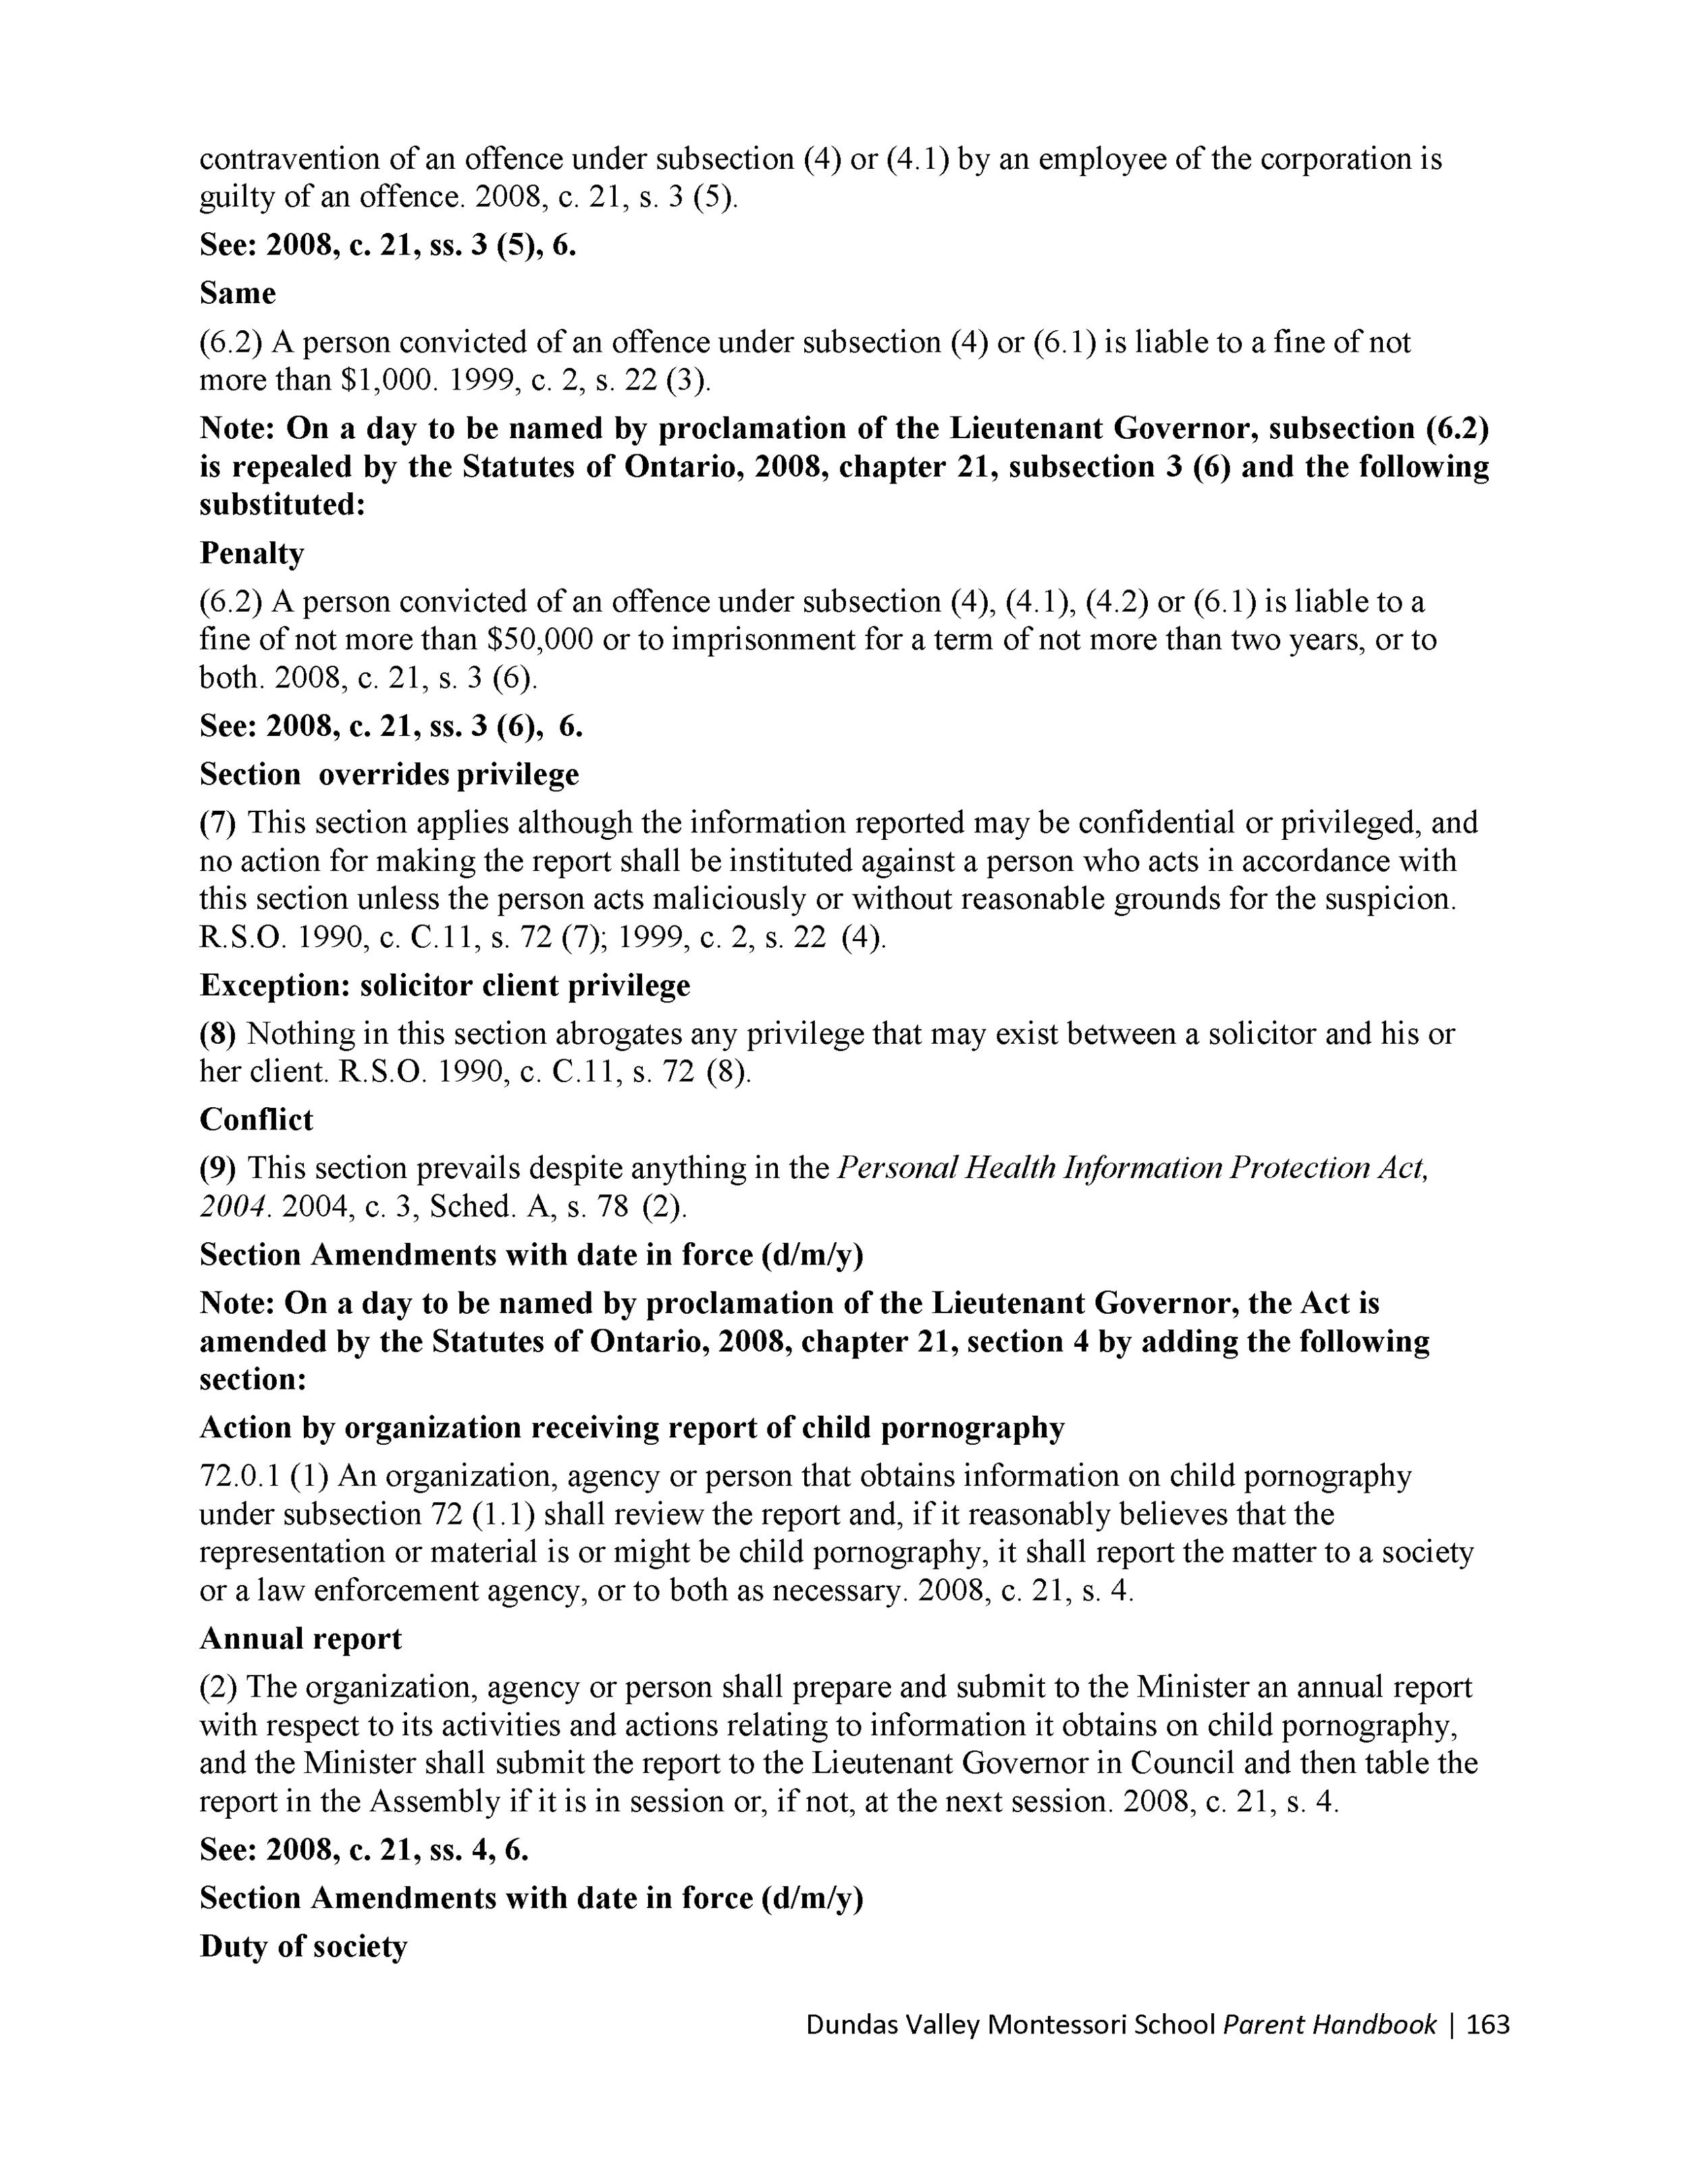 DVMS-Parent-Handbook-19-20_Page_165.png